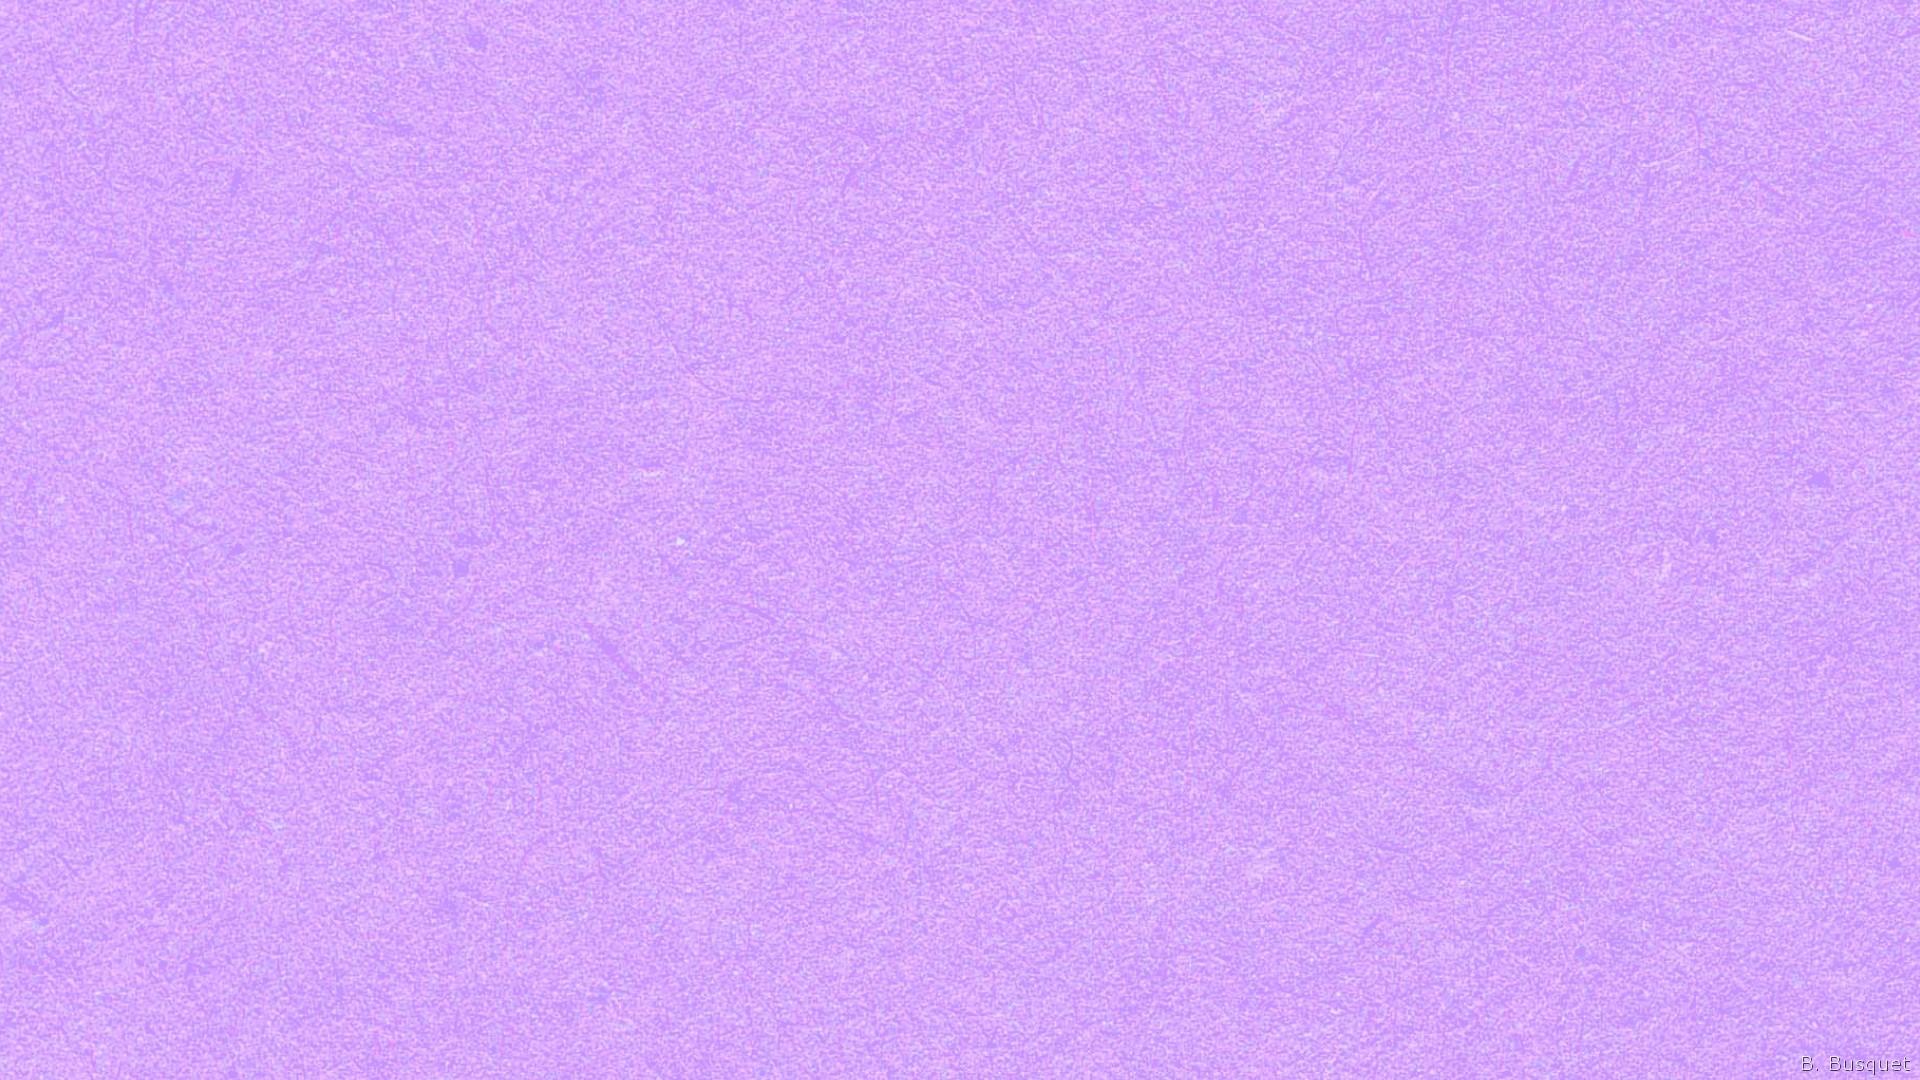 light purple wallpaper hd - photo #10